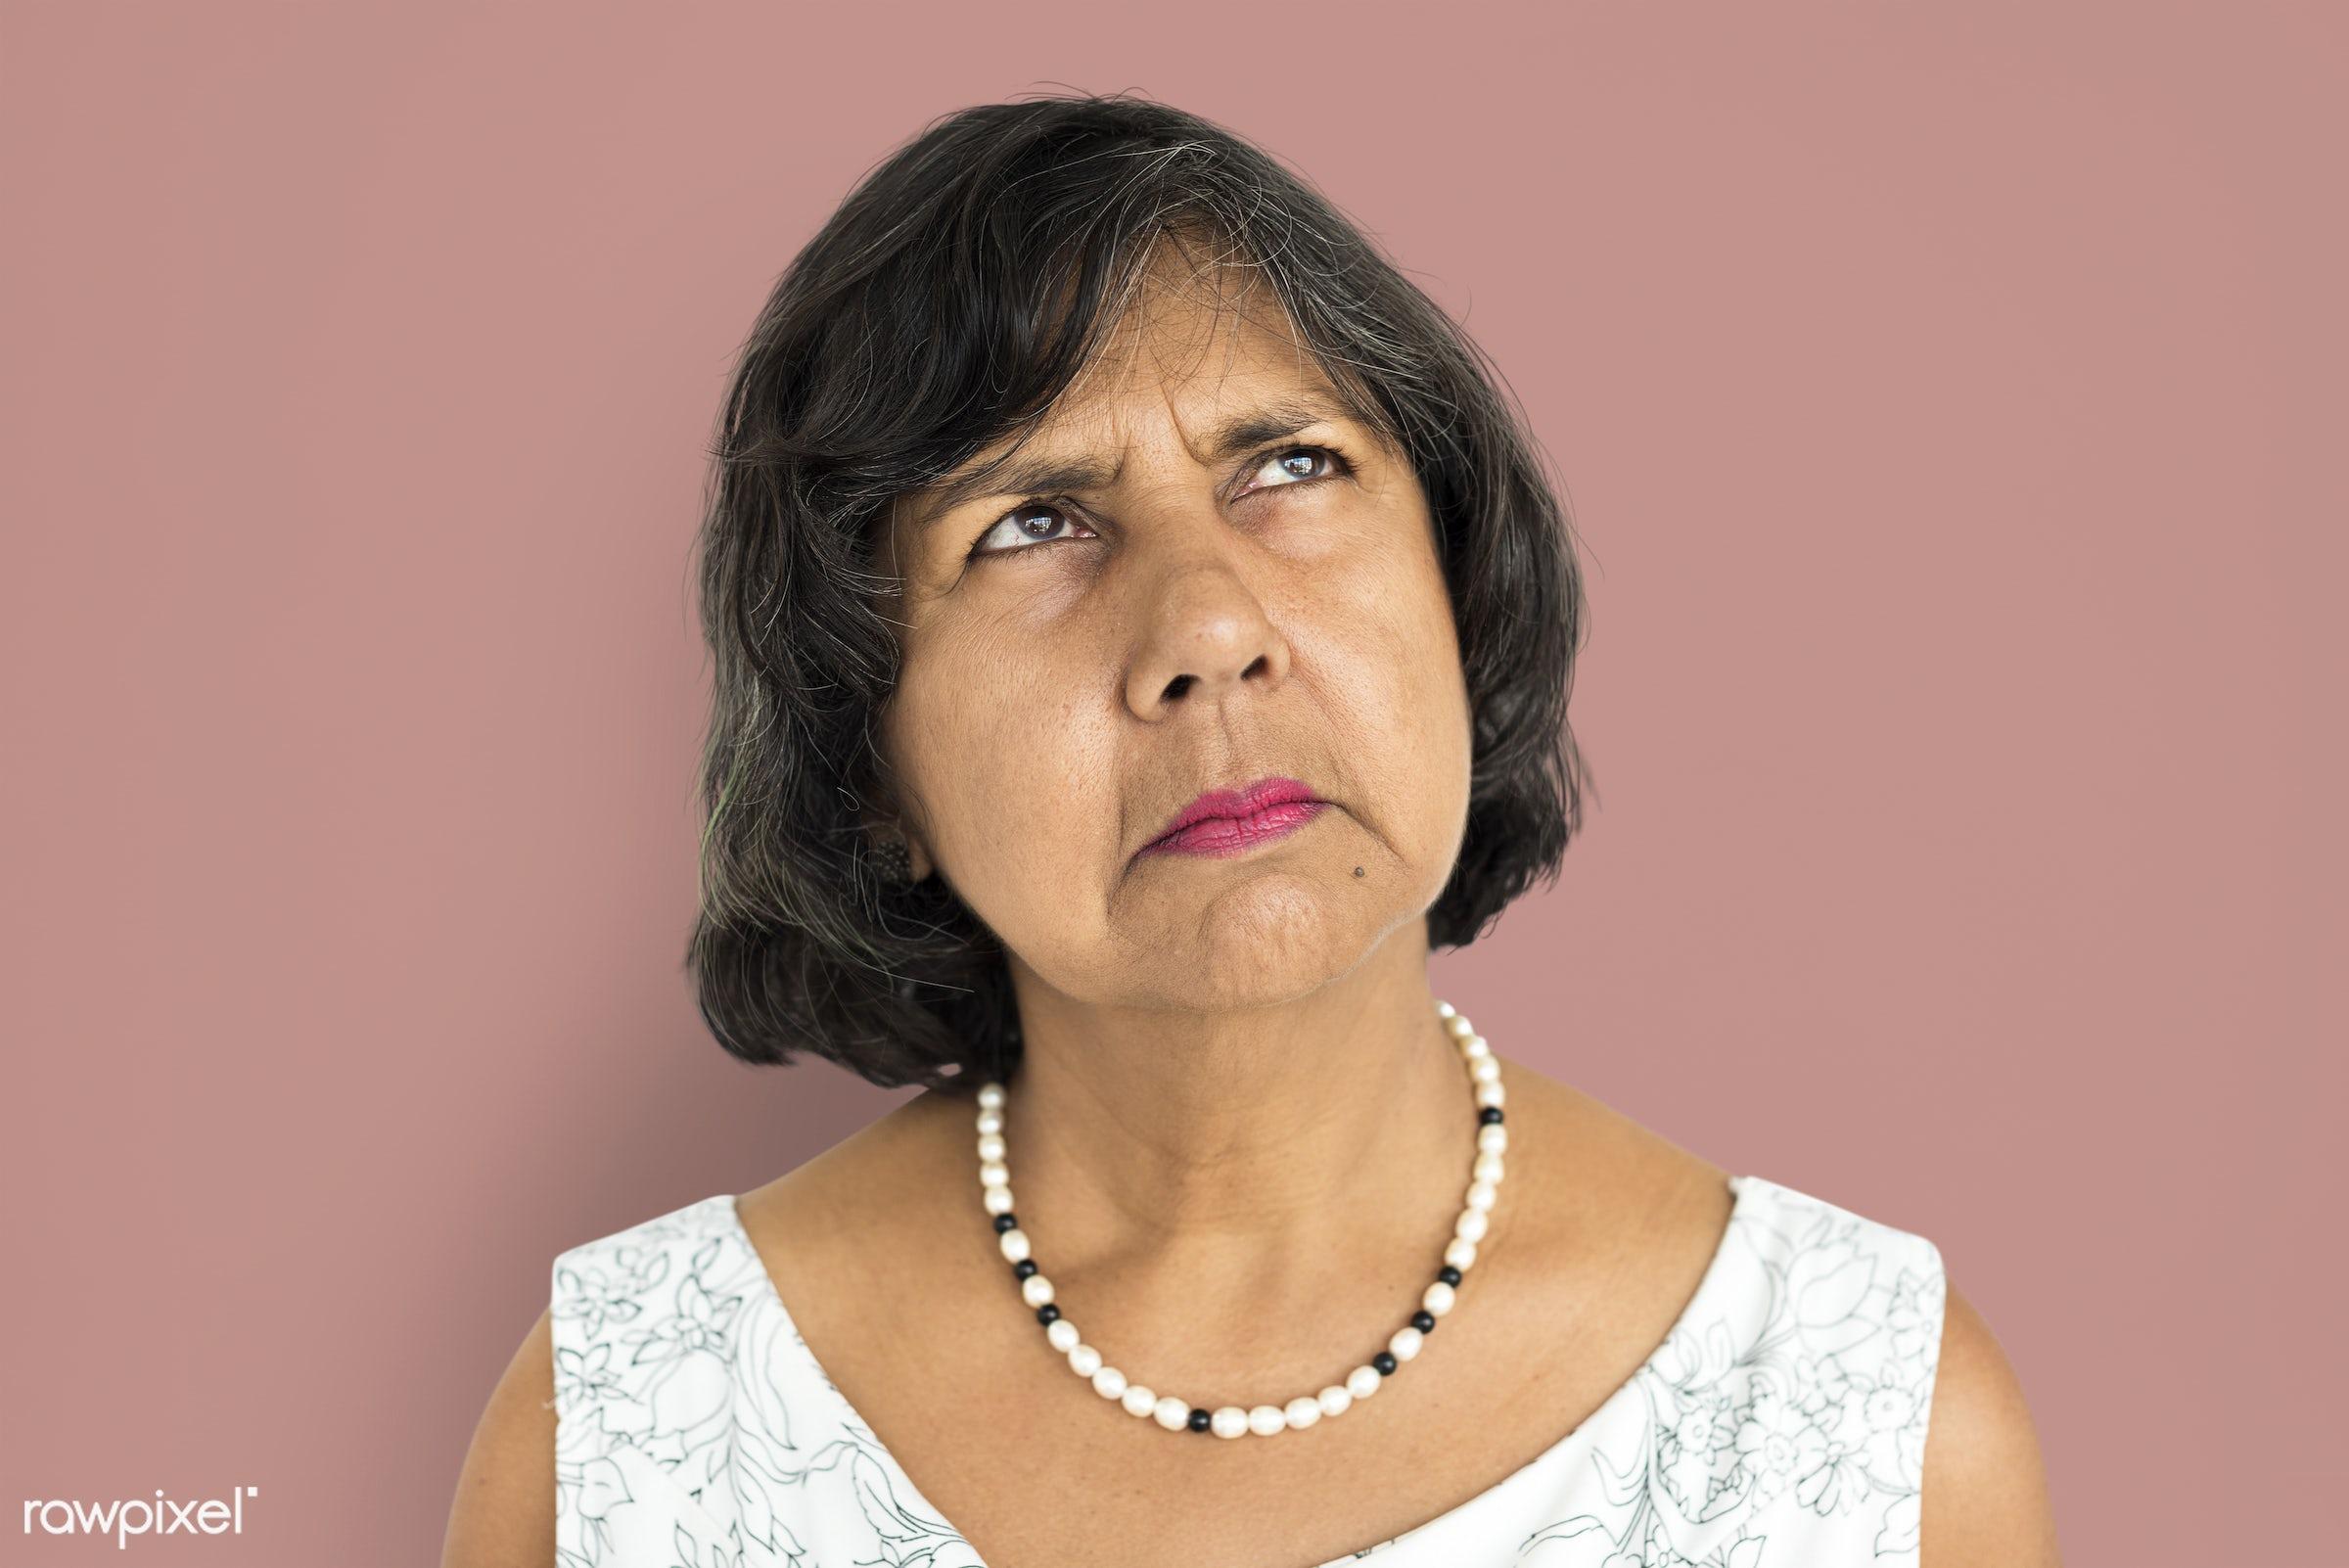 expression, studio, old, person, sad, heartbroken, grumpy, people, caucasian, girl, sadden, woman, american, broken heart,...